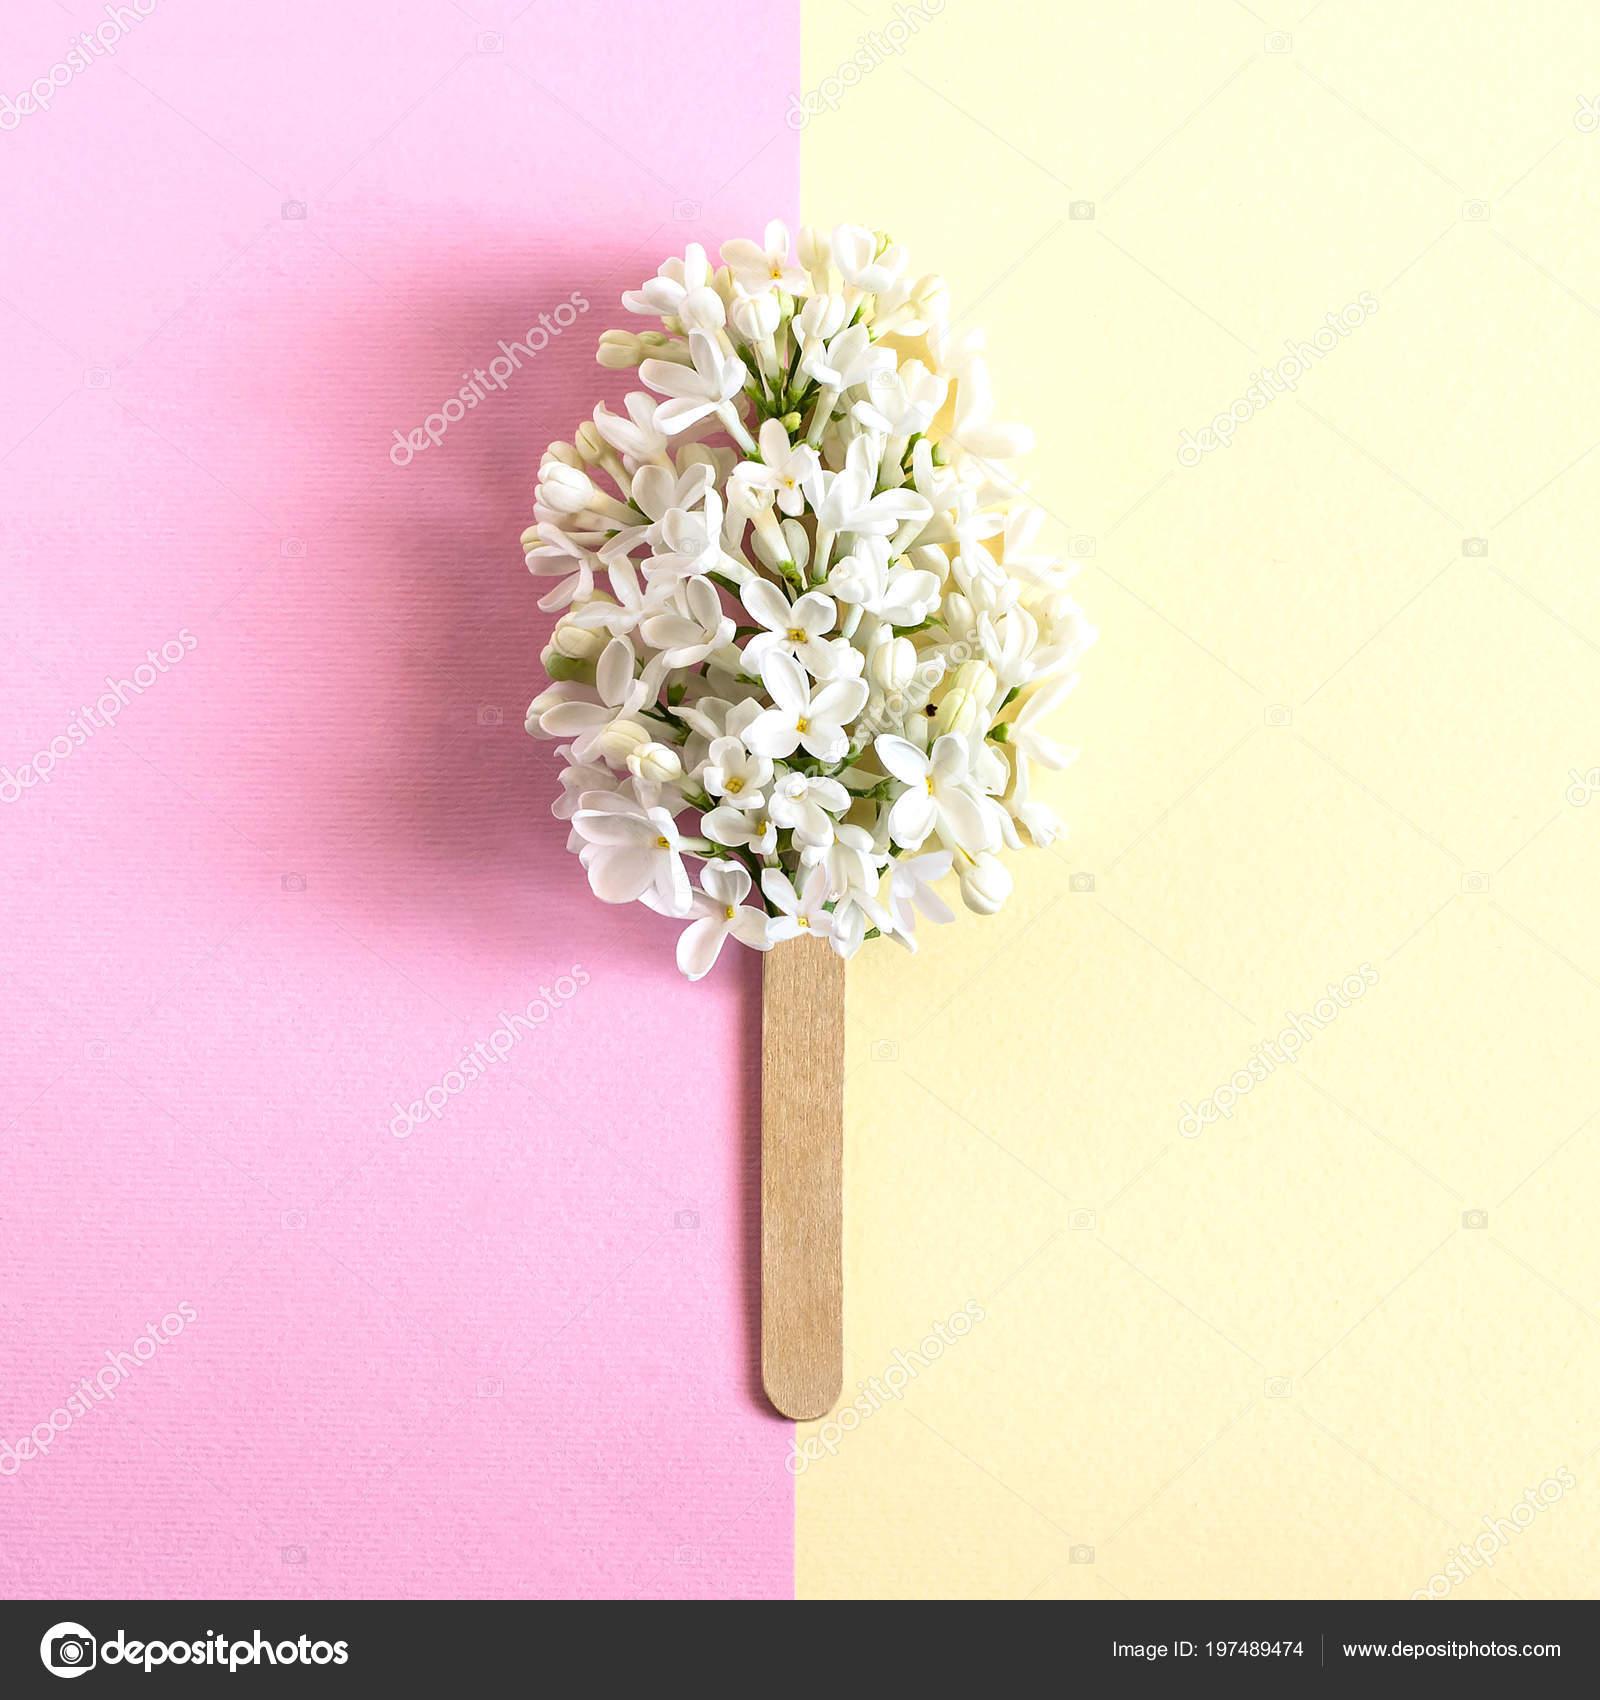 03390d0447 Λουλούδια από λευκό λιλά σε stick σαν popsicle. Μινιμαλισμός. Δημιουργική ιδέα  καλοκαιρινή τροφή. Δύο χρώμα παστέλ φόντο.